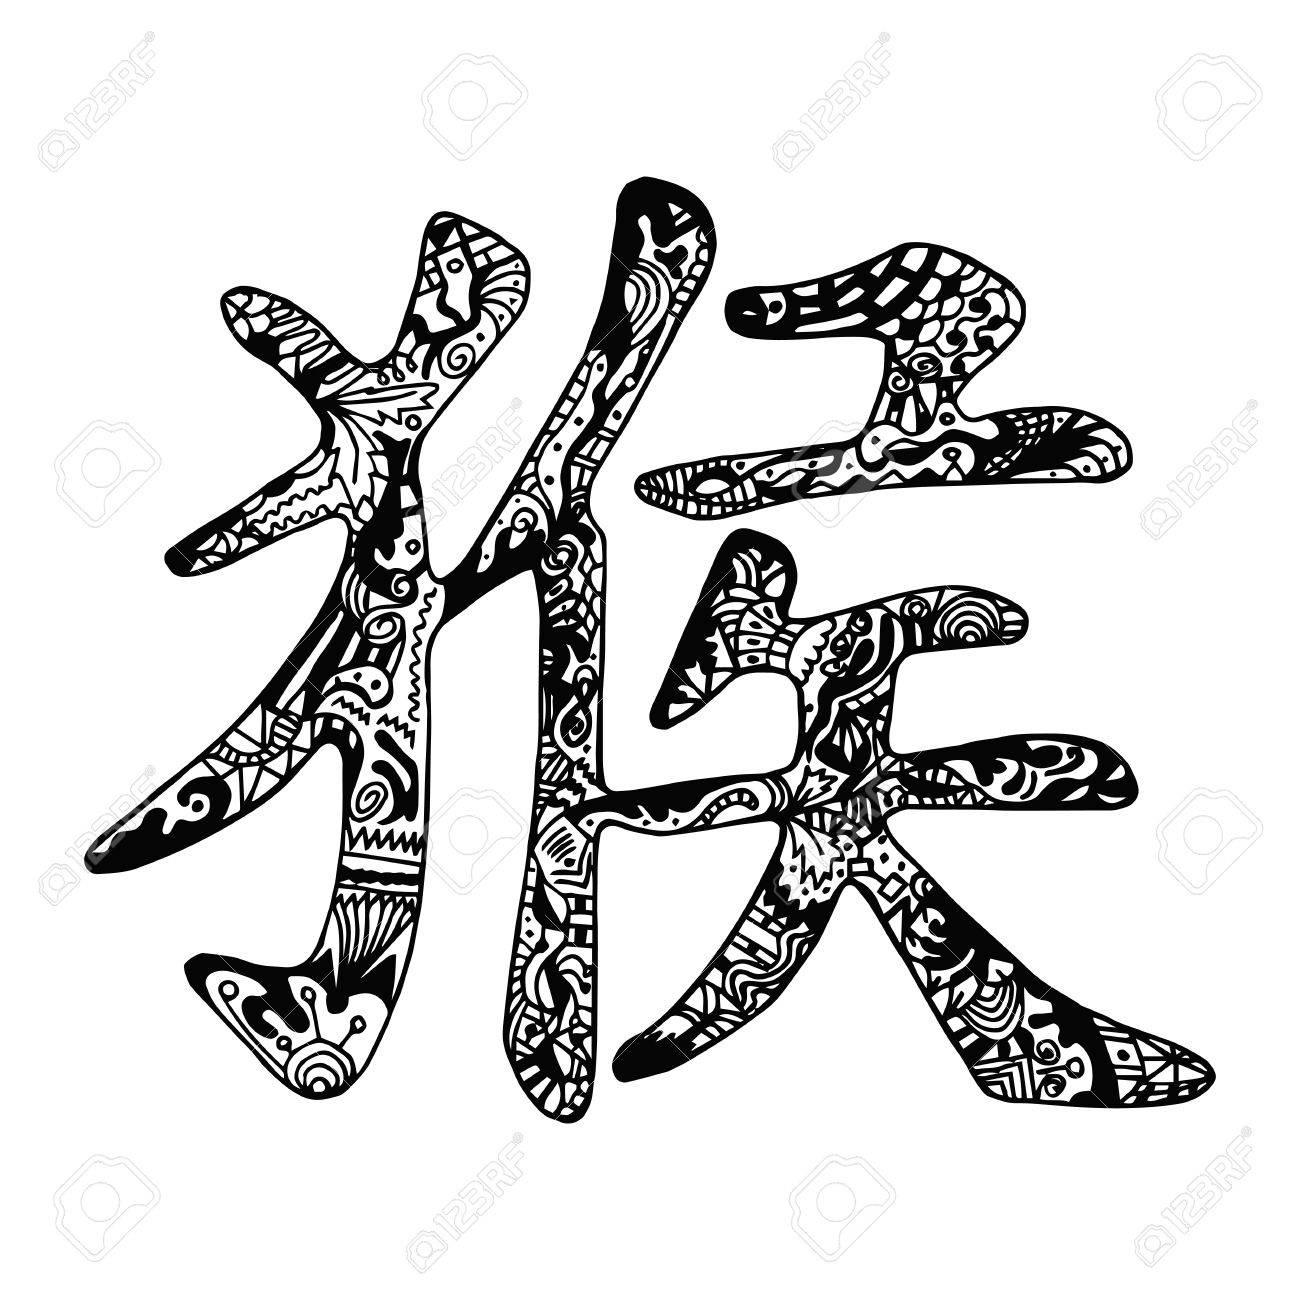 Black Monkey Hieroglyph On White Background Chinese Symbol With